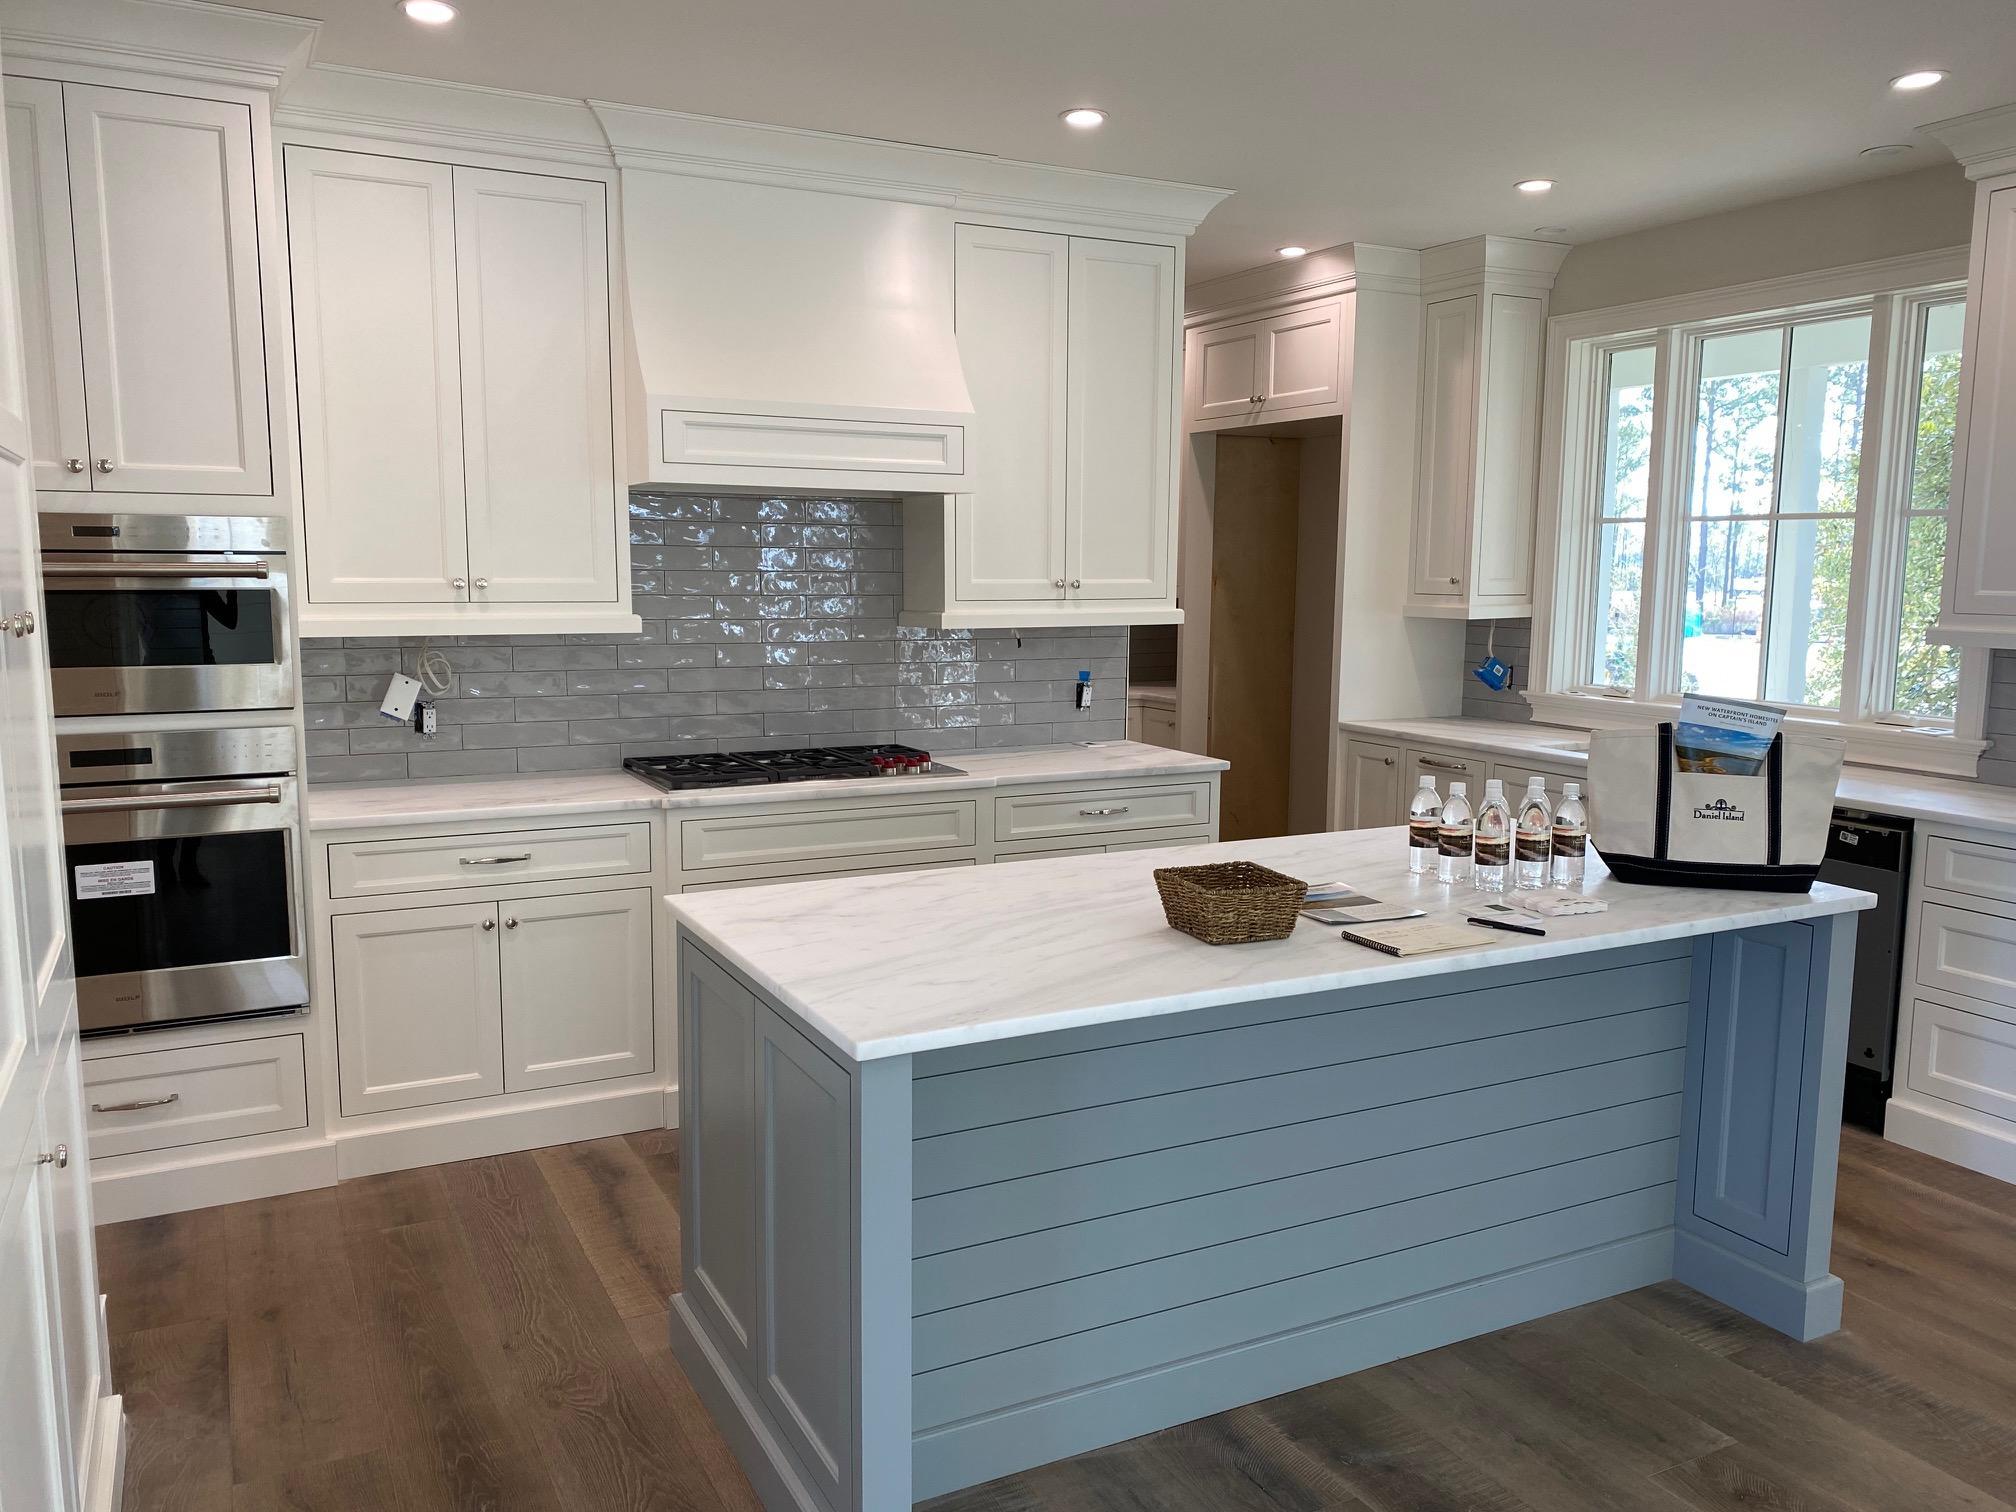 Daniel Island Park Homes For Sale - 325 Bayley, Charleston, SC - 6